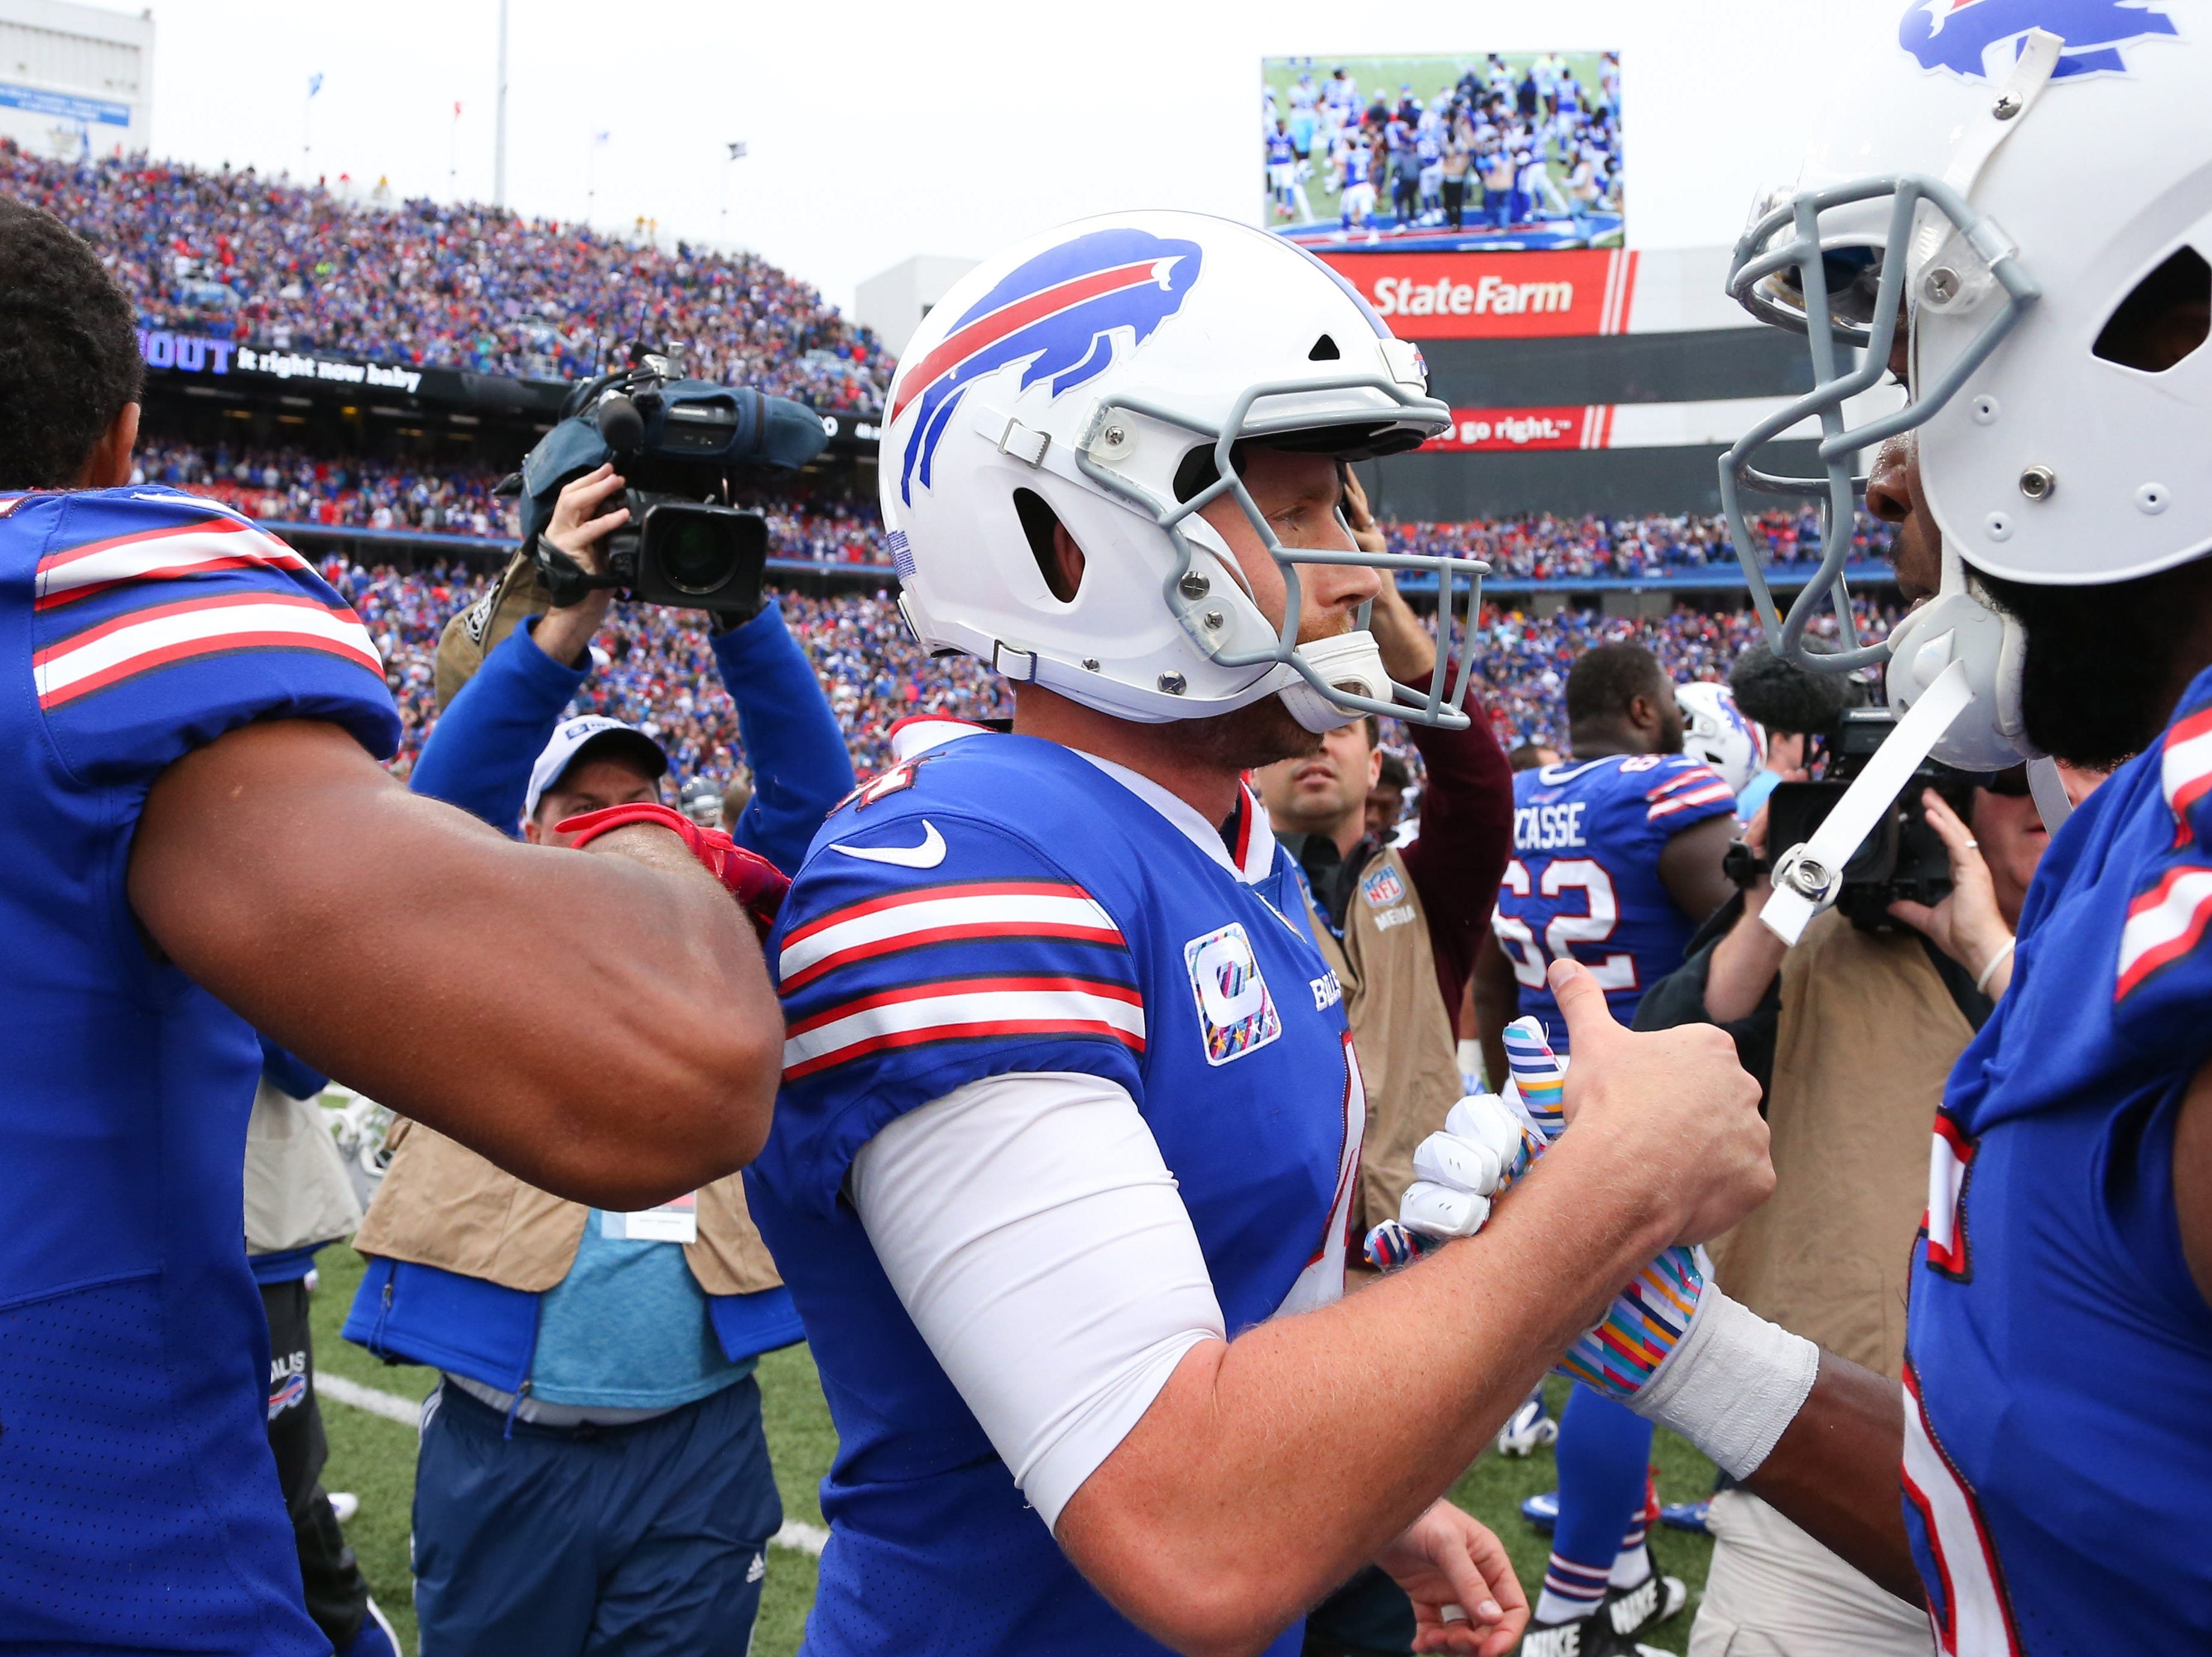 Oct 7, 2018; Orchard Park, NY, USA; Buffalo Bills kicker Stephen Hauschka (4) celebrates after kicking a game winning field goal against the Tennessee Titans at New Era Field.